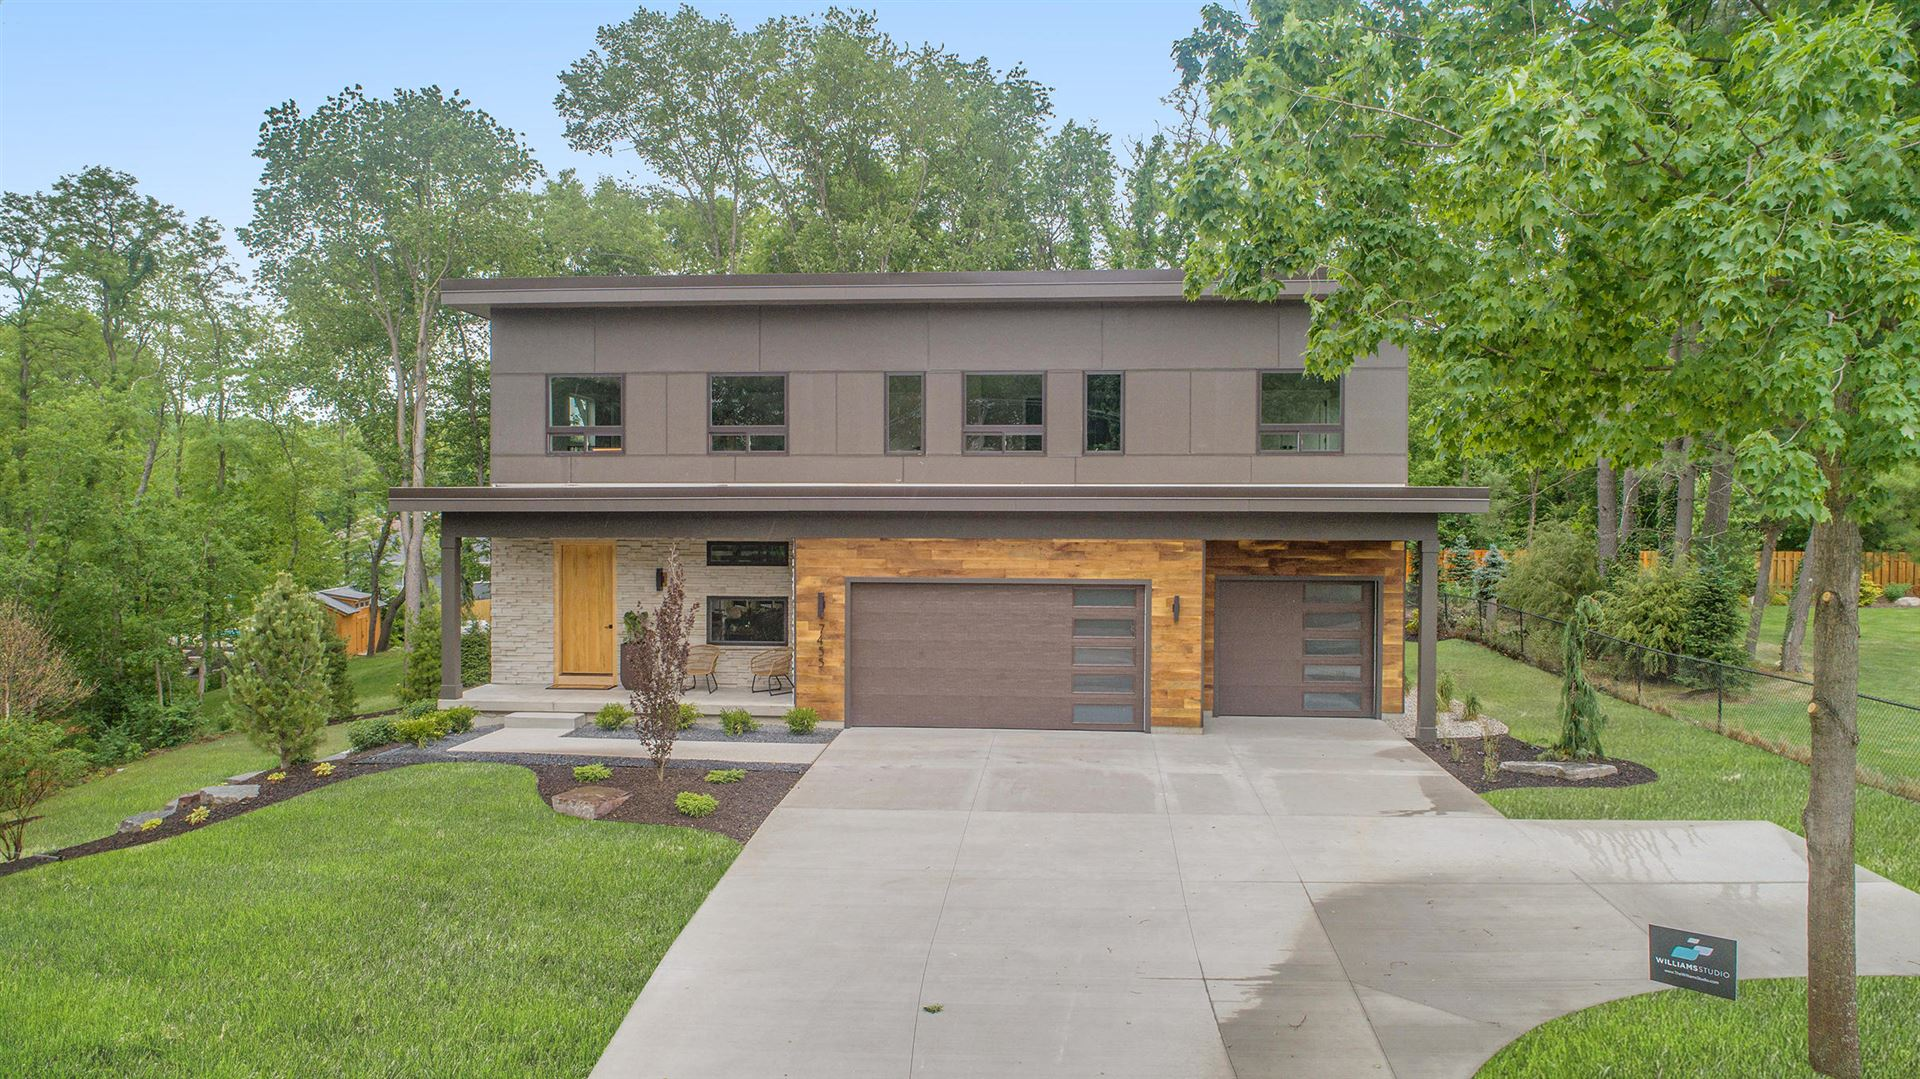 Photo of 7455 Cascade Road SE, Grand Rapids, MI 49546 (MLS # 21021295)